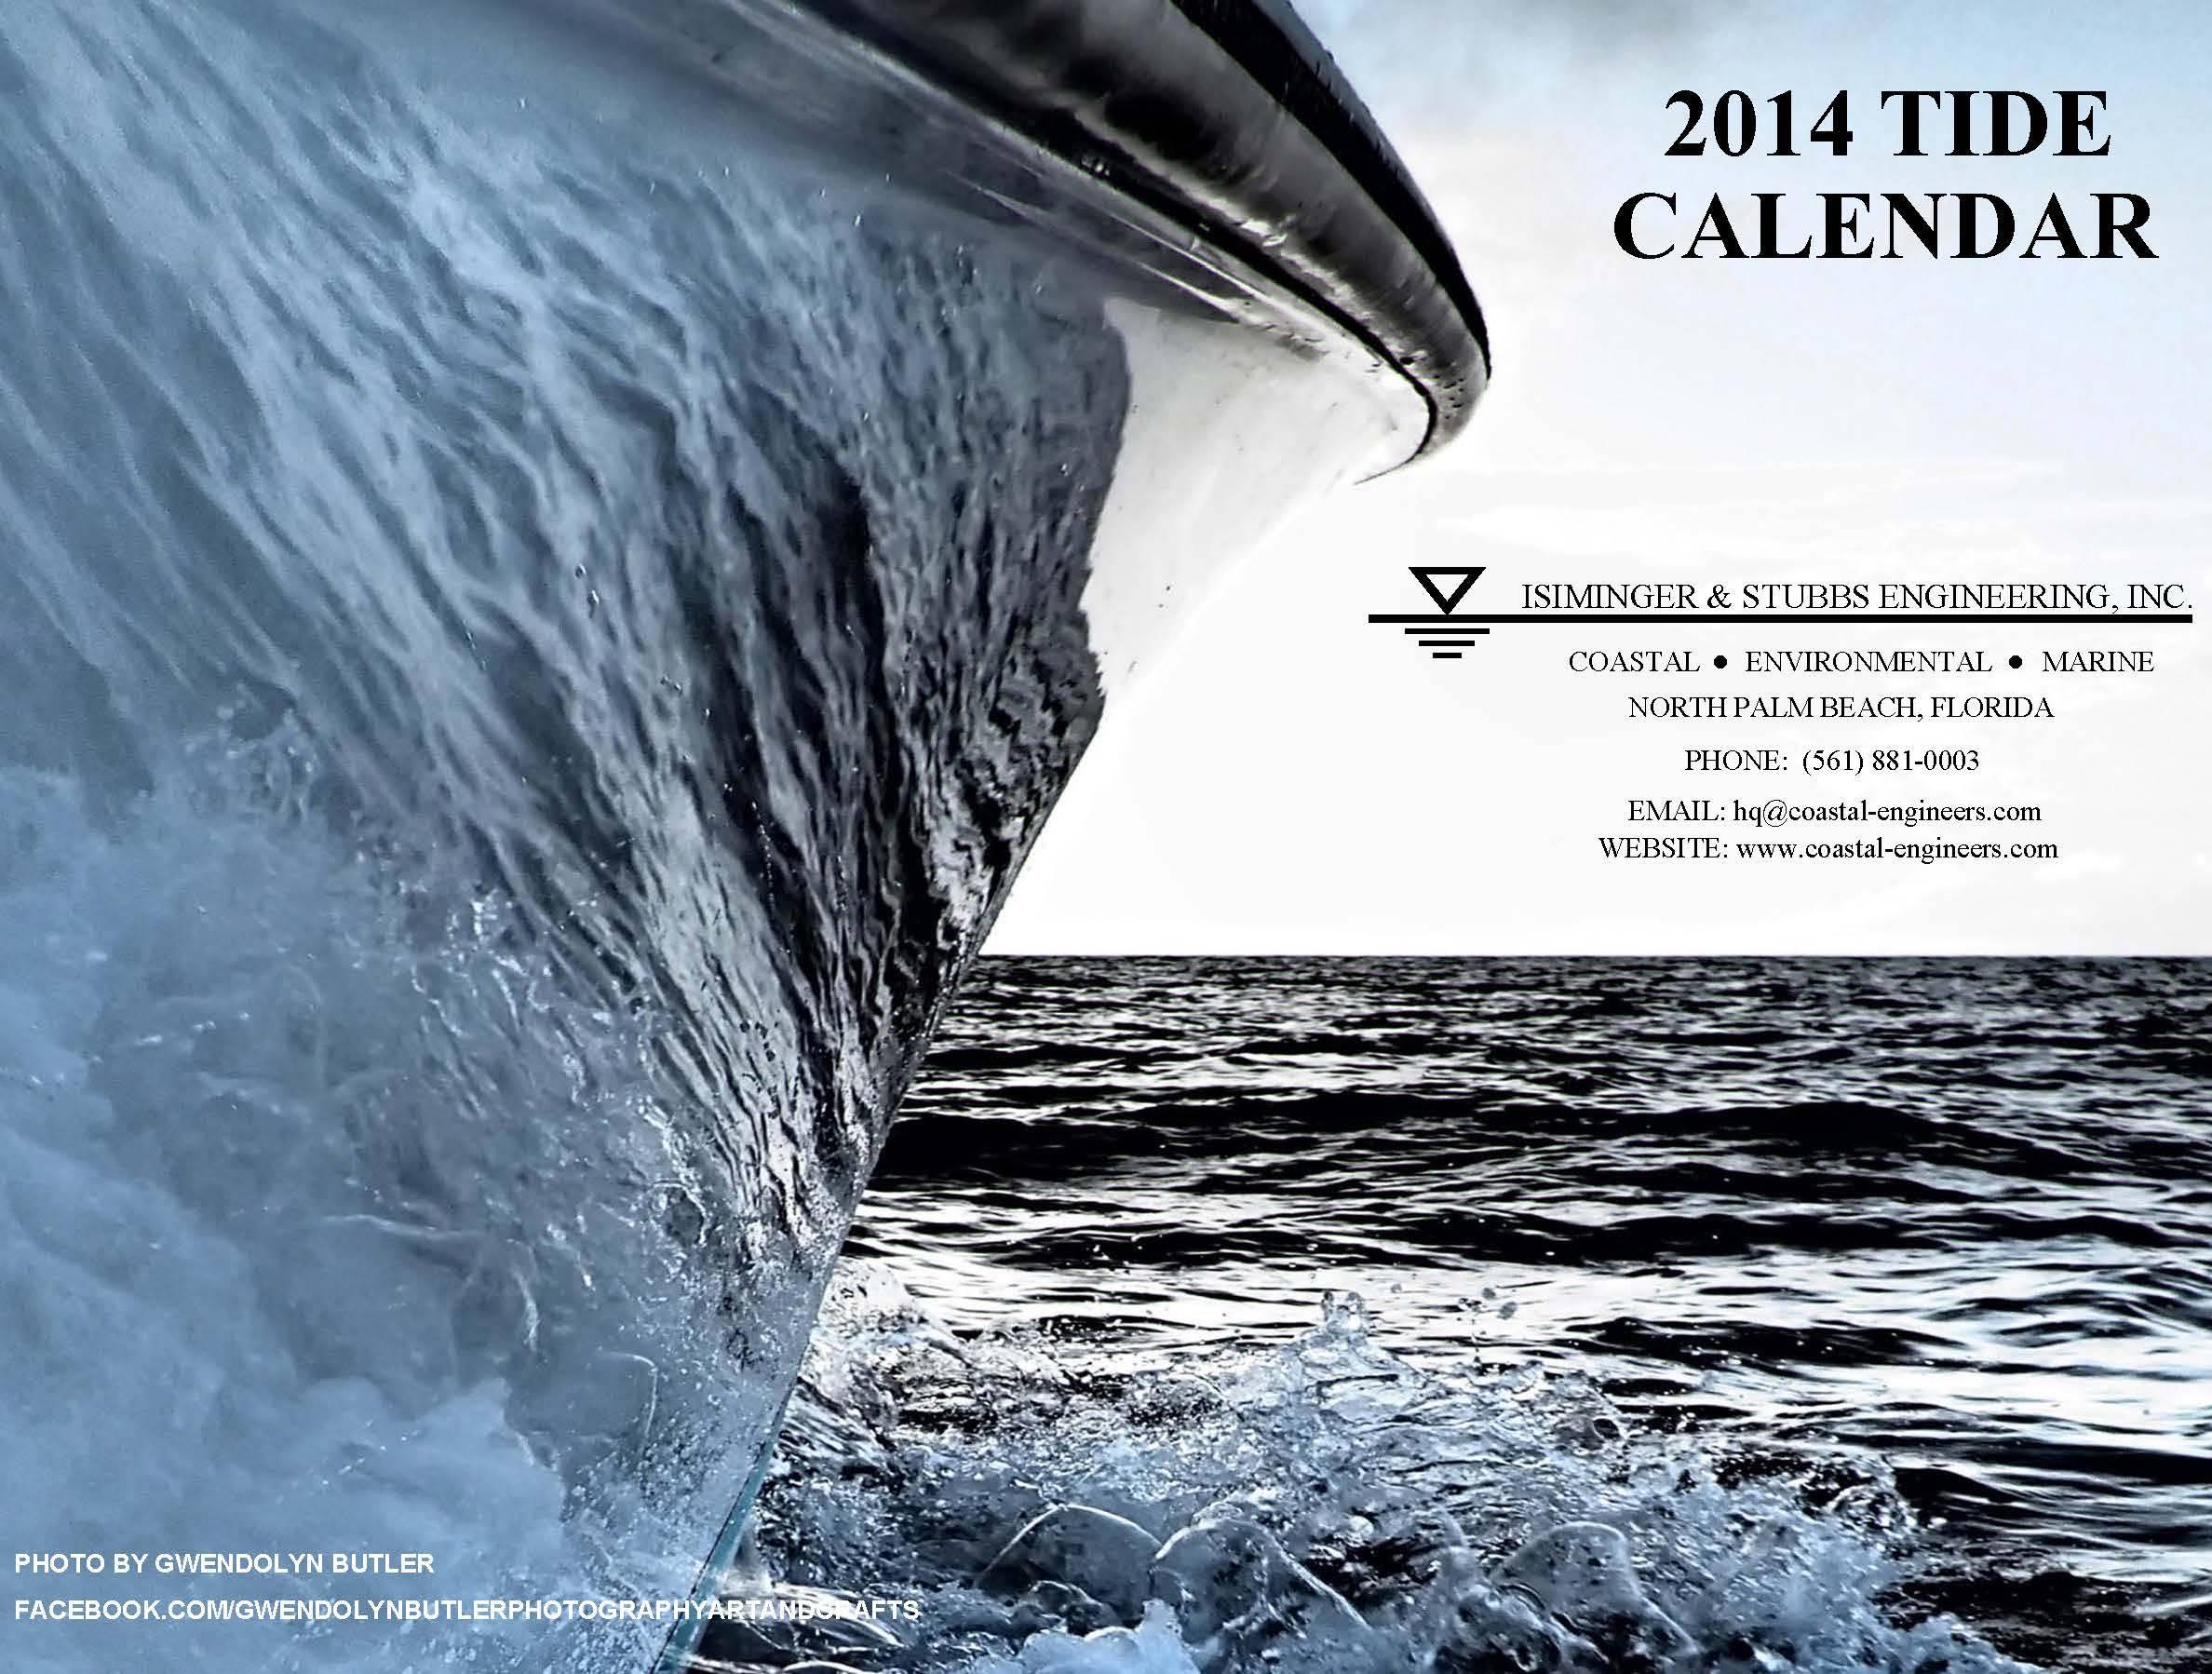 2014 Tide Calendar Cover